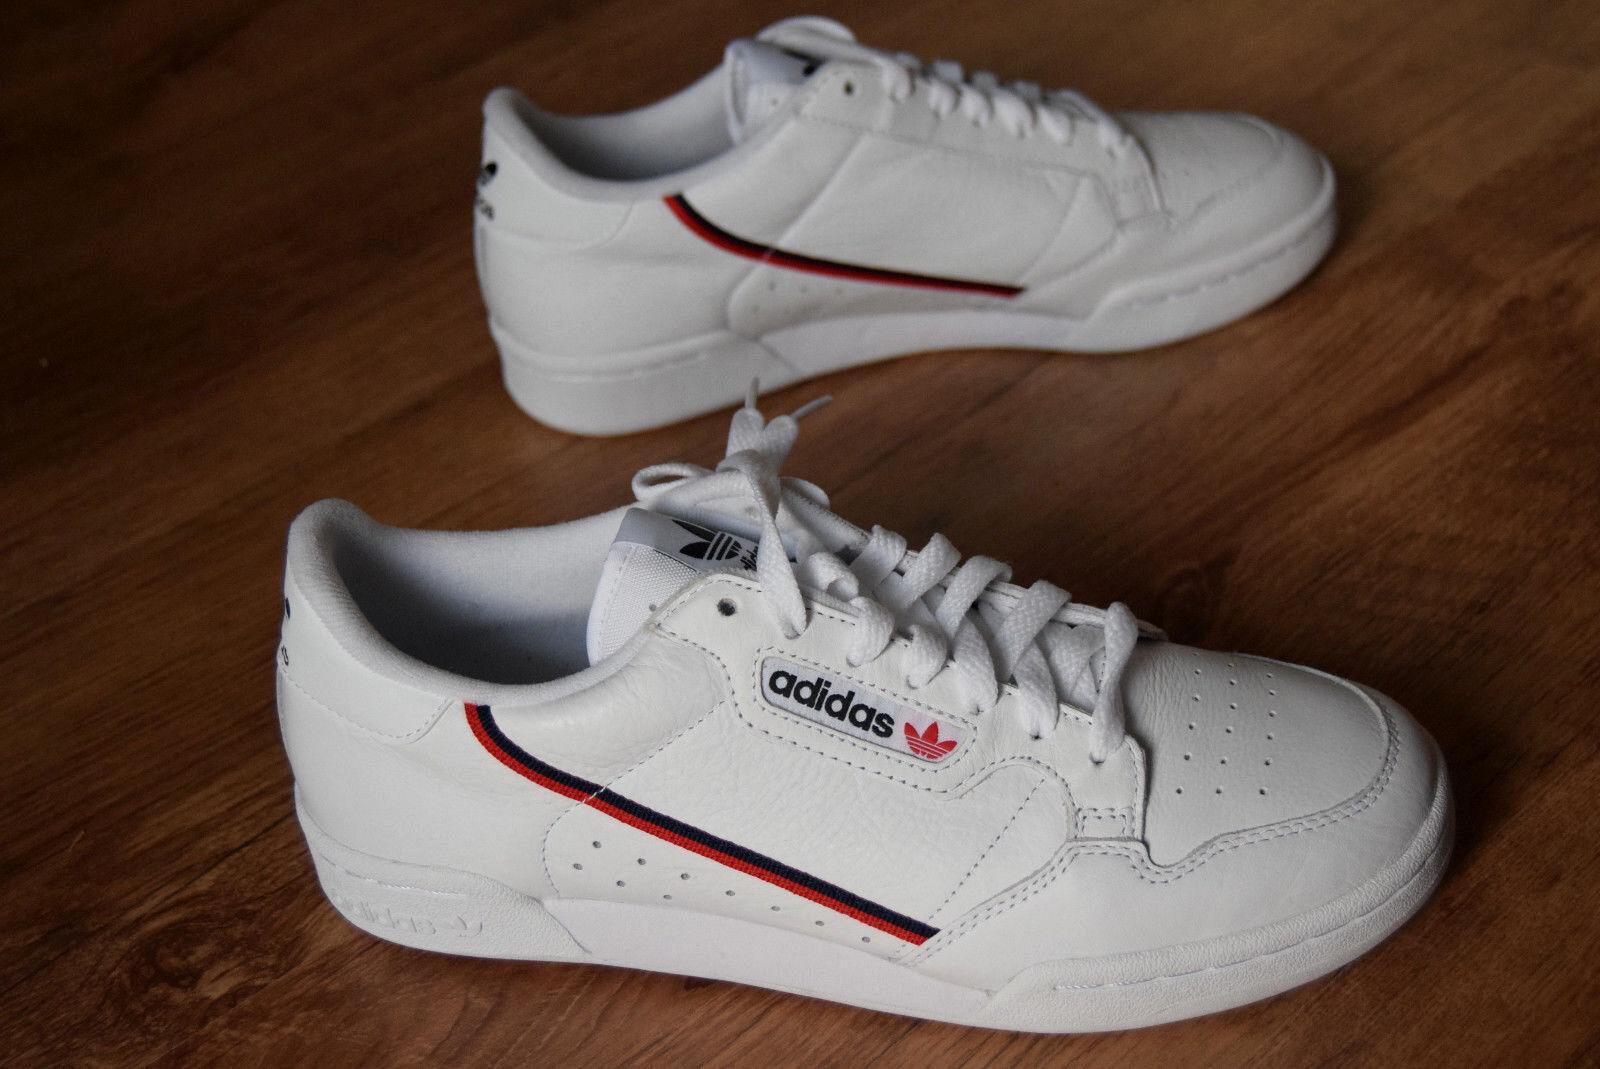 B41674 43 42,5 gr 80 Continental Adidas Classic 39 Markt